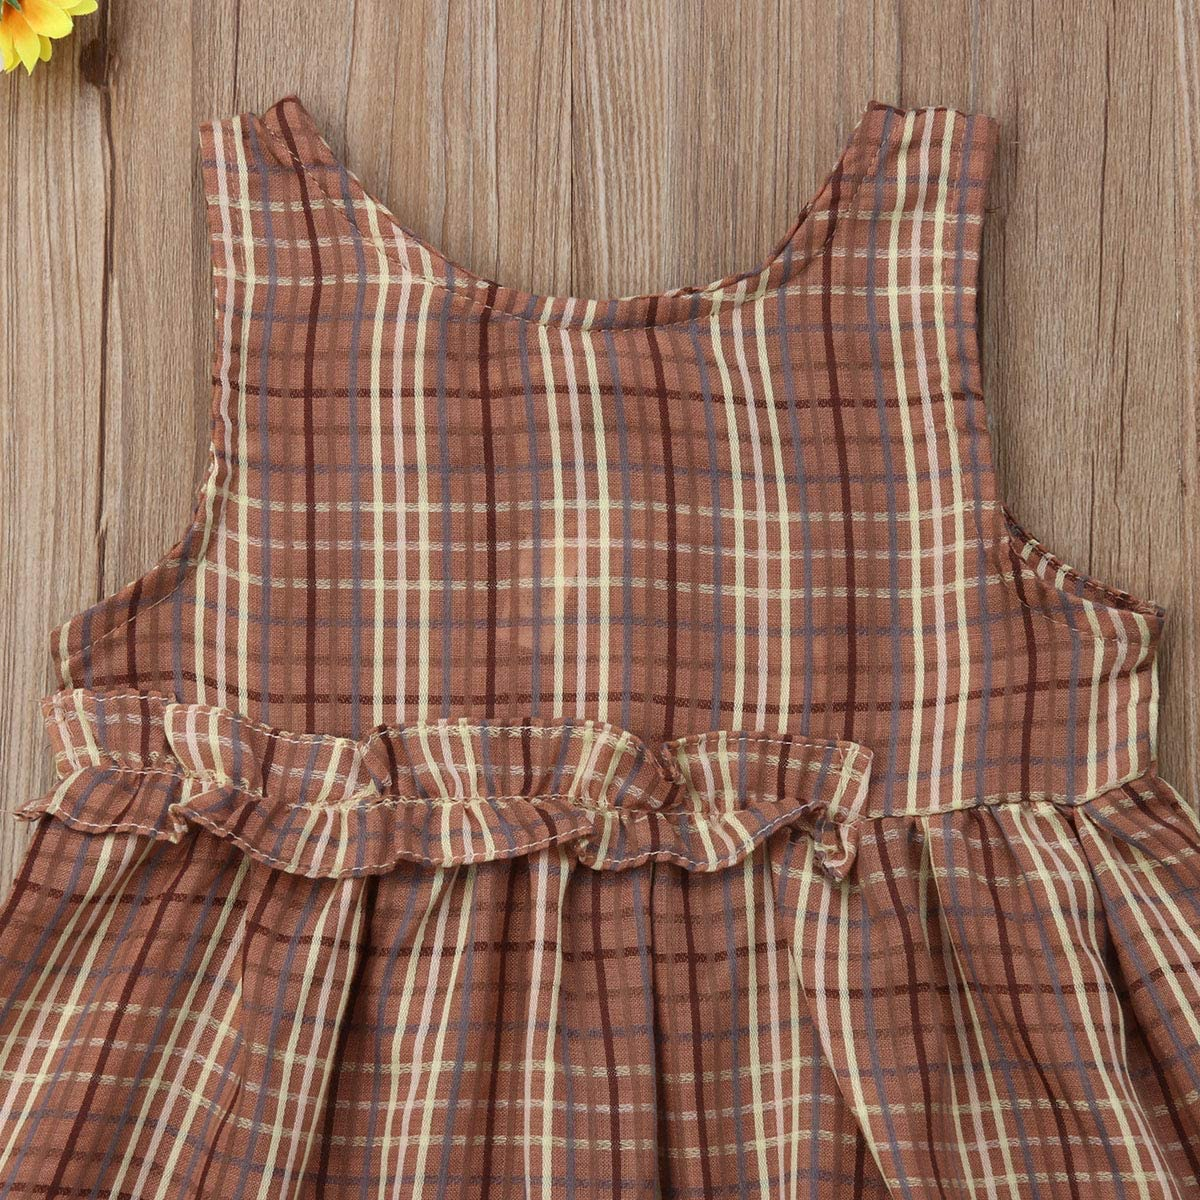 Infant Kid Baby Girls Sleeveless Plaid Ruffled Dress Princess Tutu Dress Sundress Summer Outfit 6M-5Y